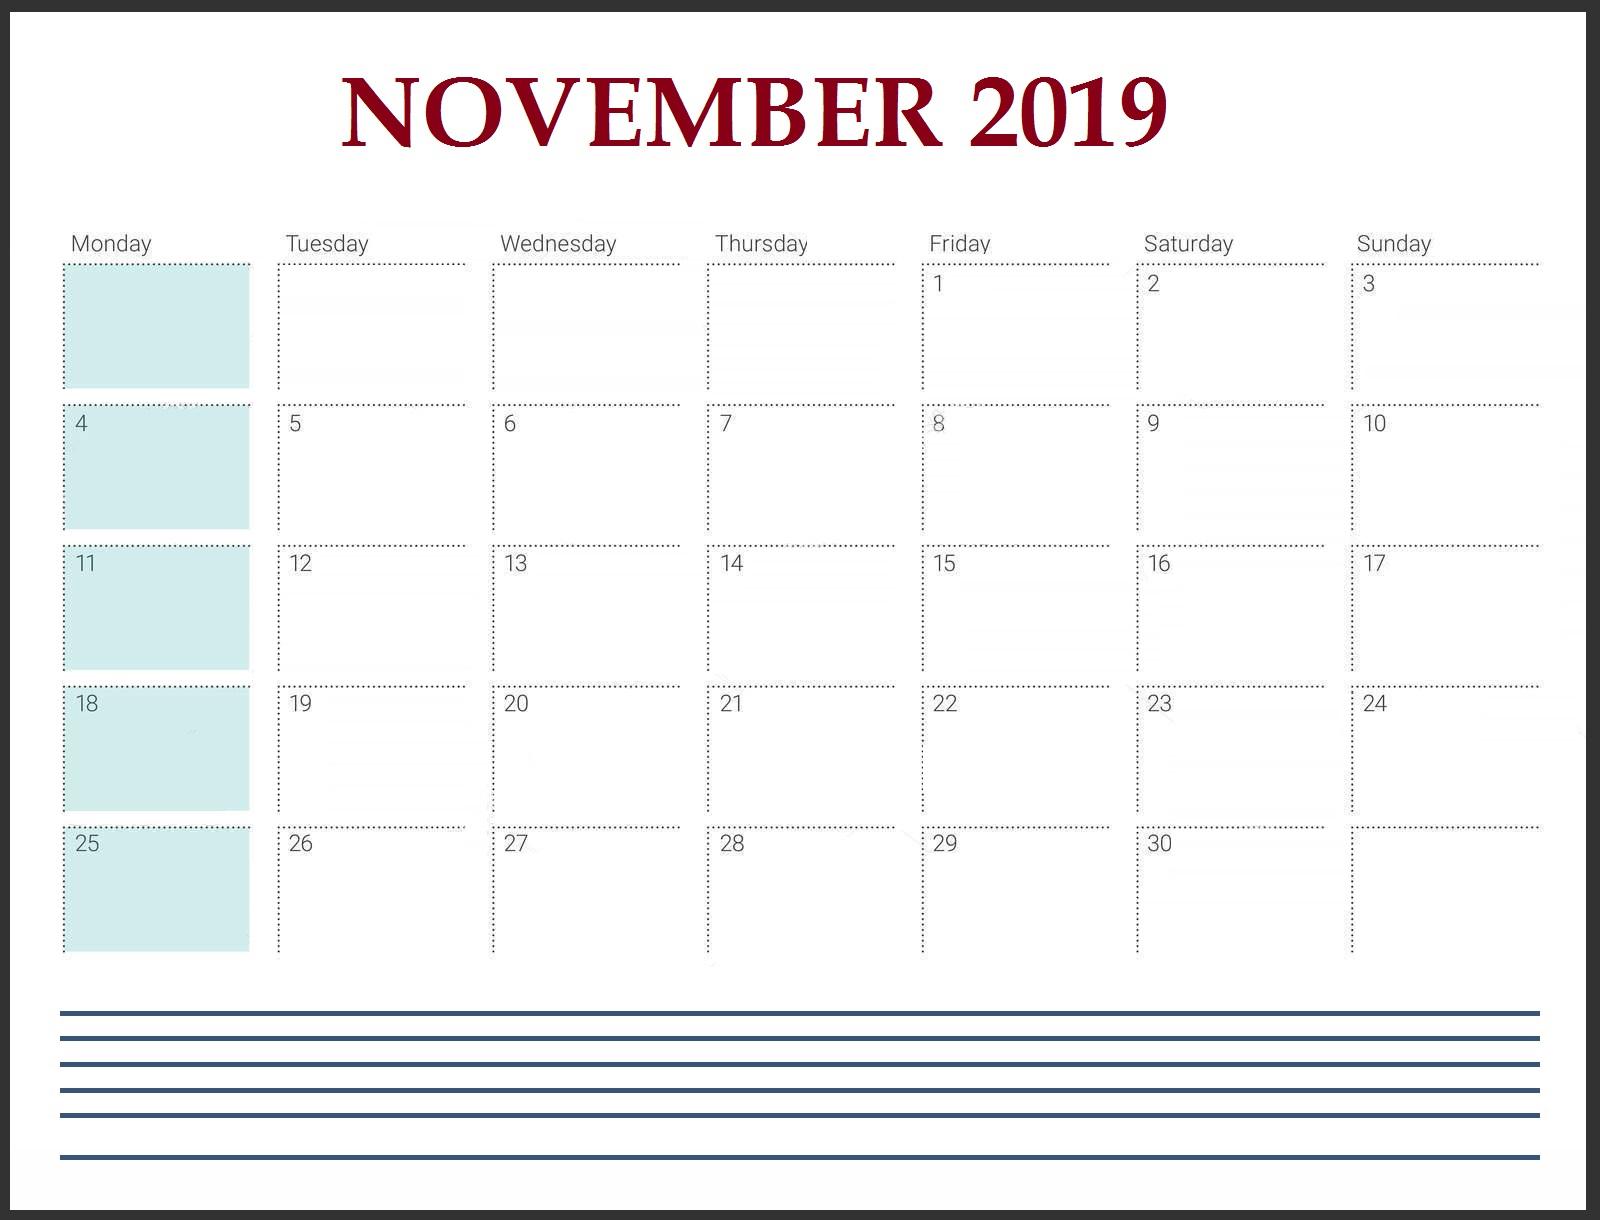 Blank November 2019 Desk Calendar